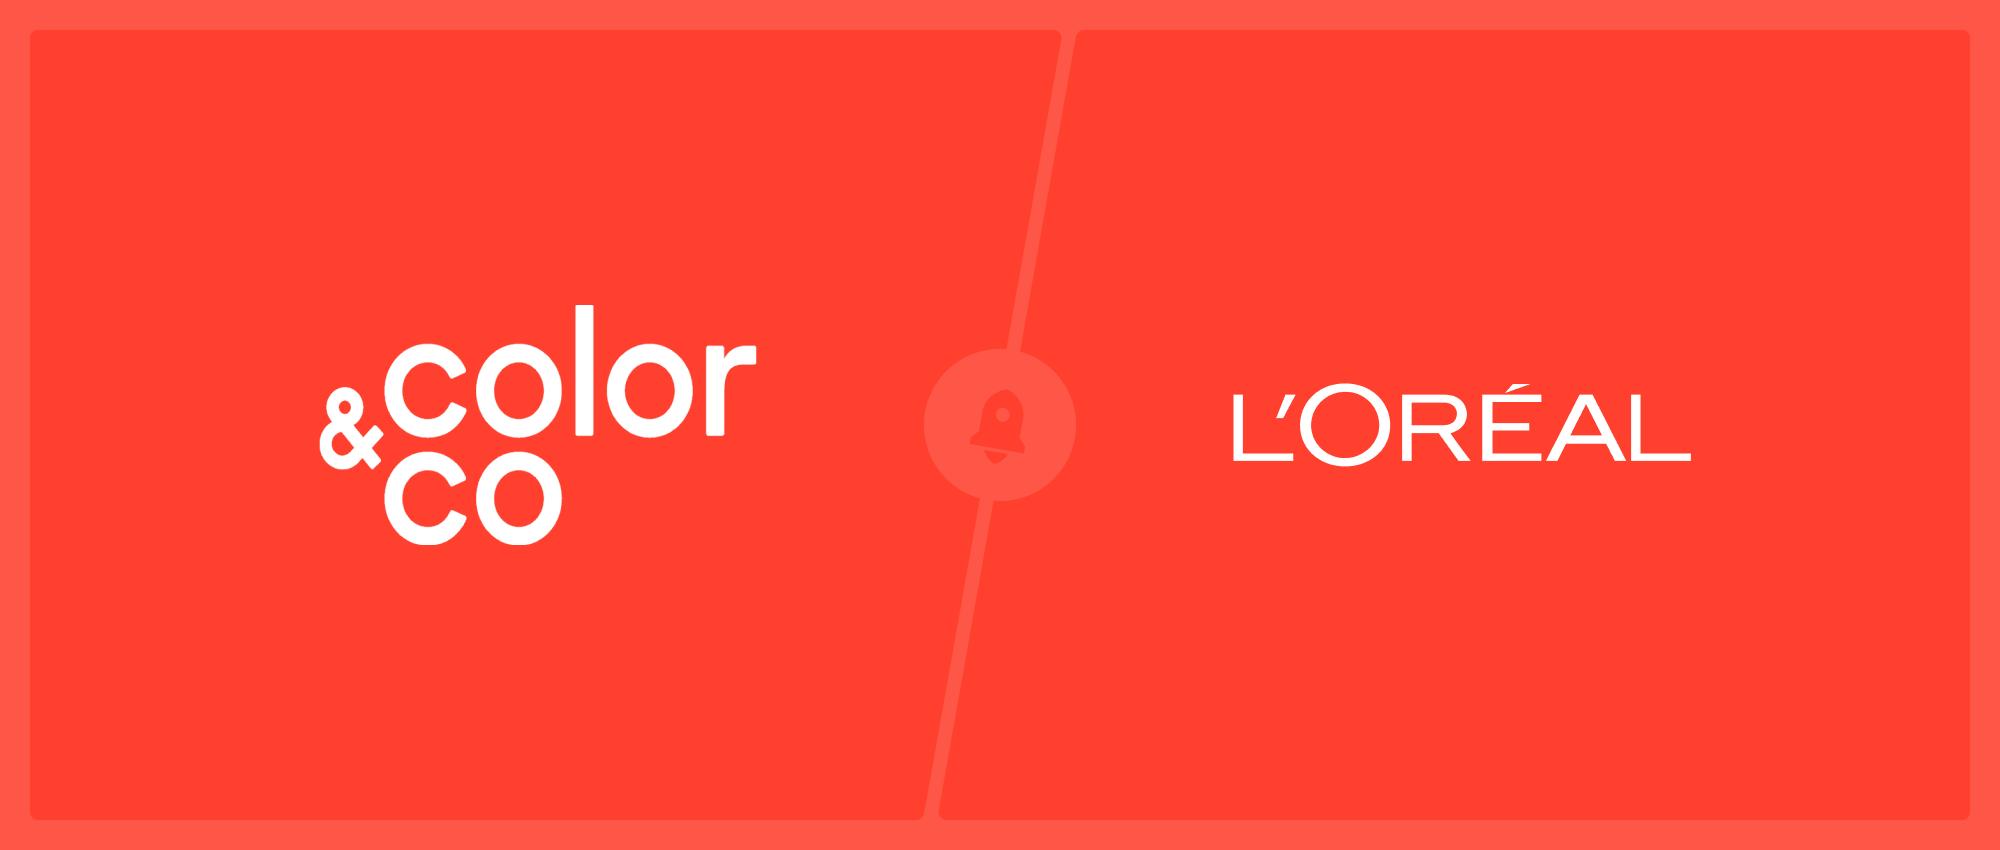 L'Oréal's color & co: The D2C salon hair colouring experience.